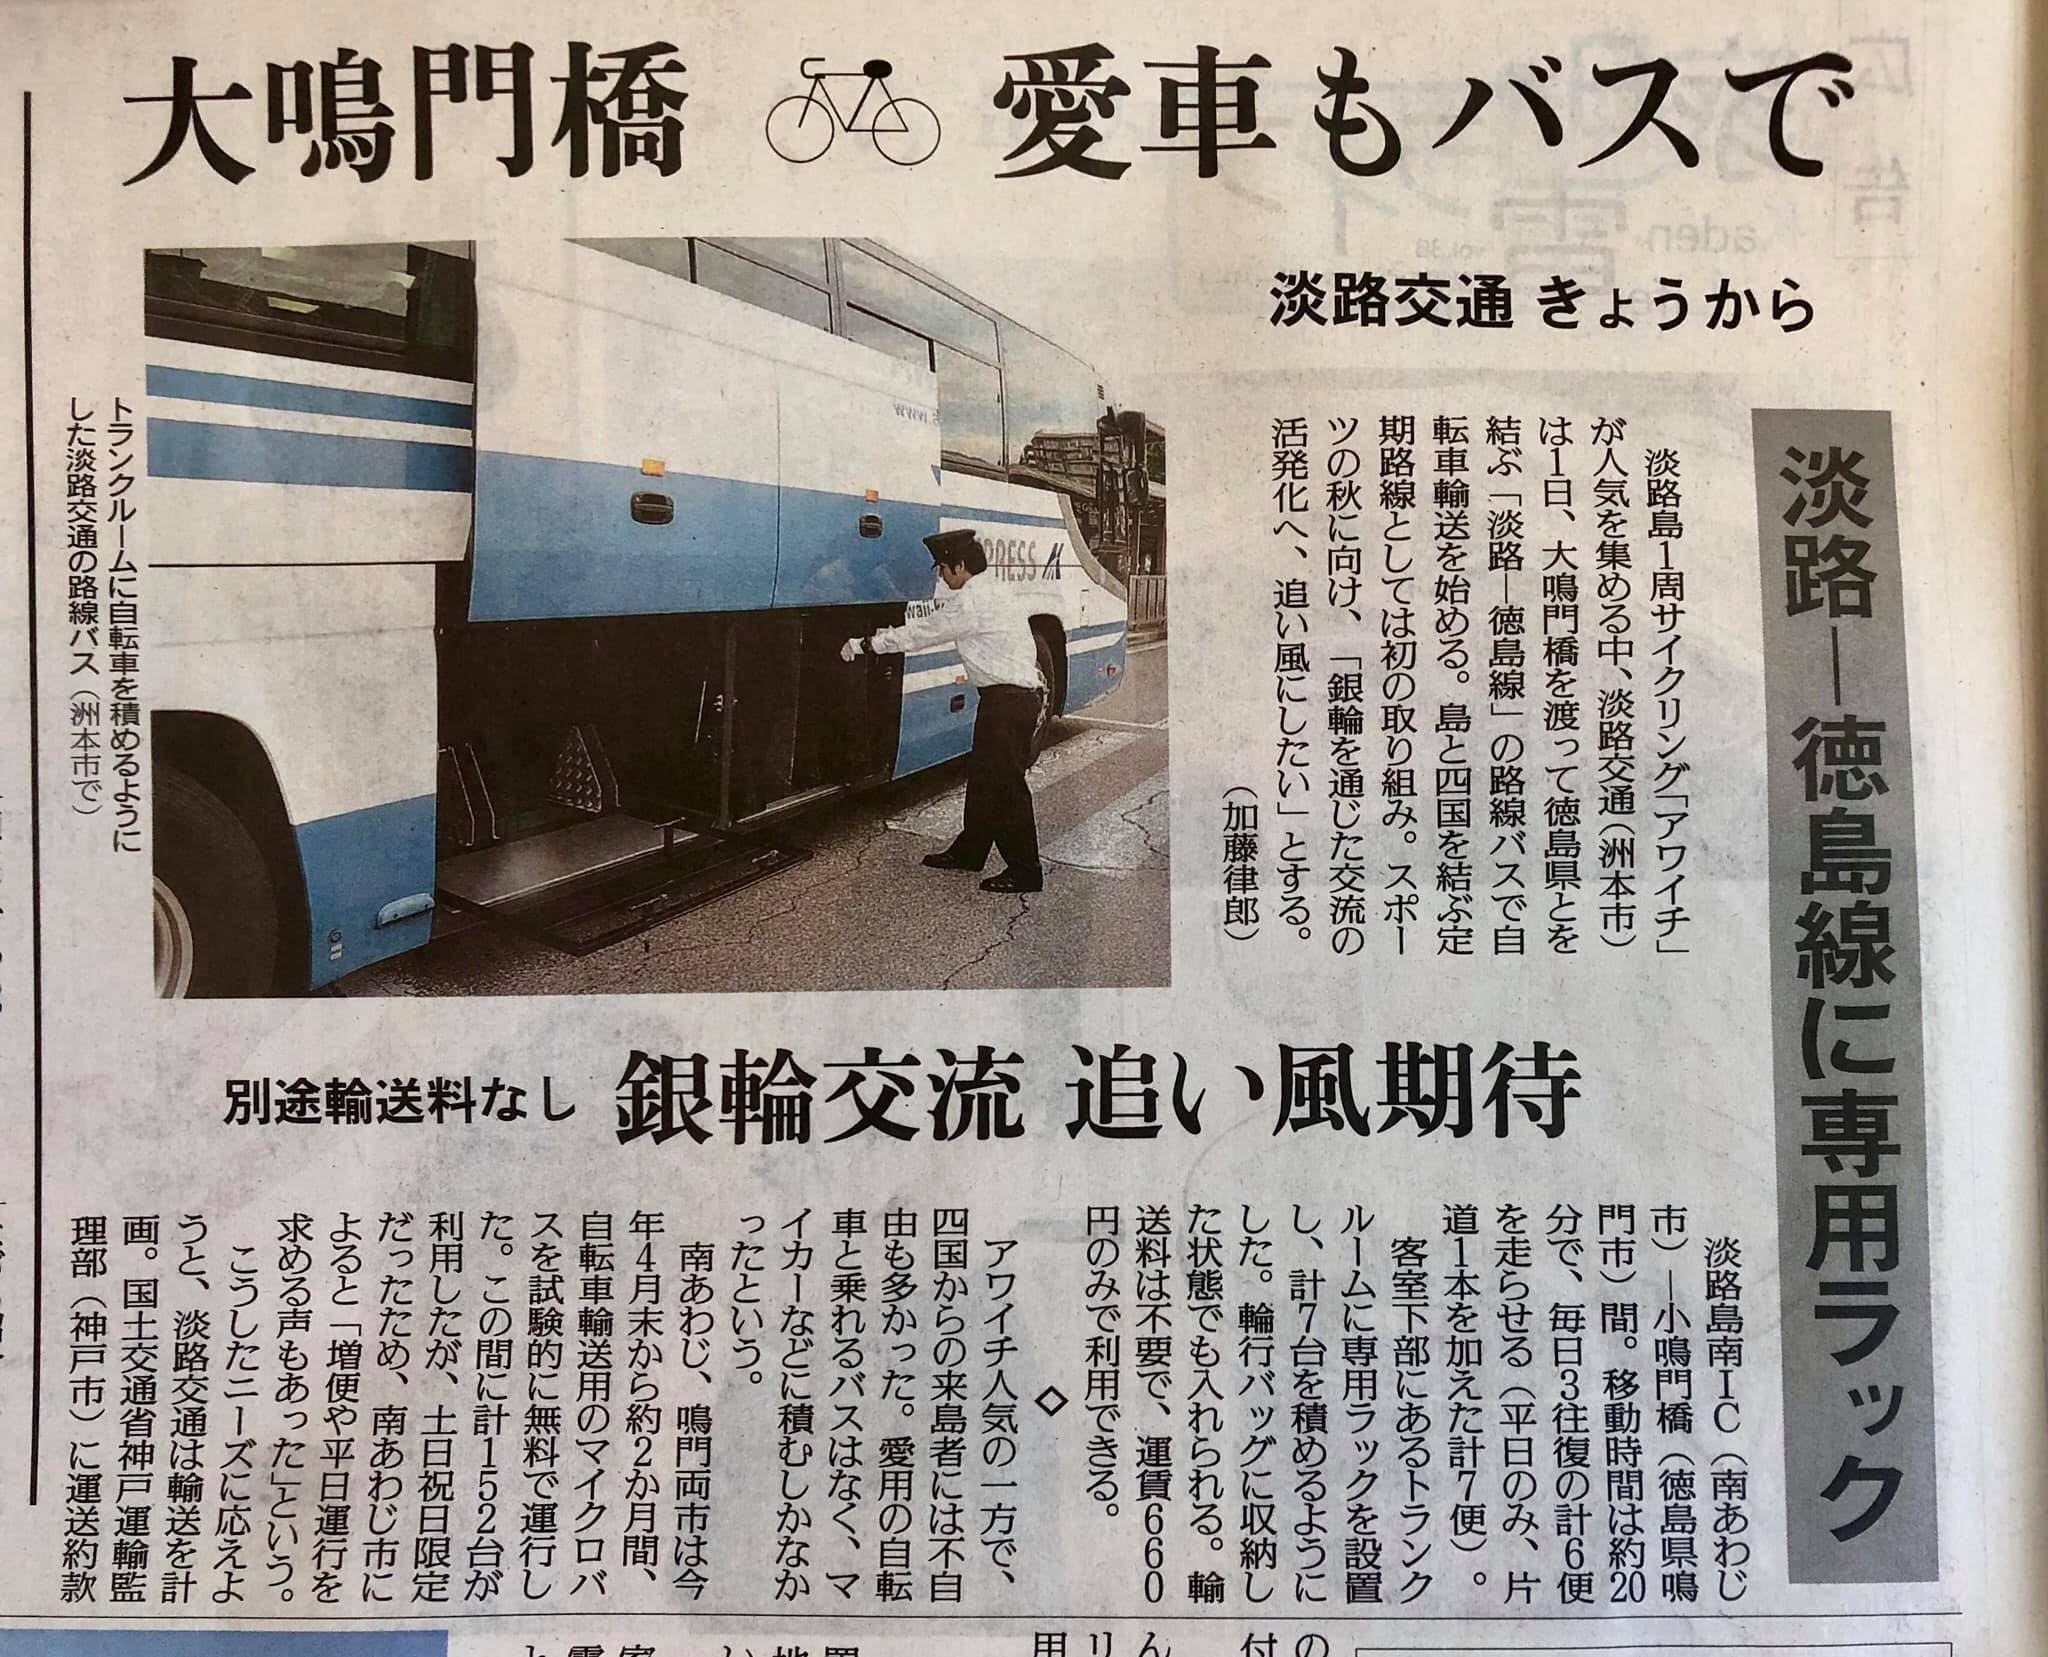 <<How to transfer to Shikoku Island with your bike, recent solution etc..>>_f0365484_11215695.jpg